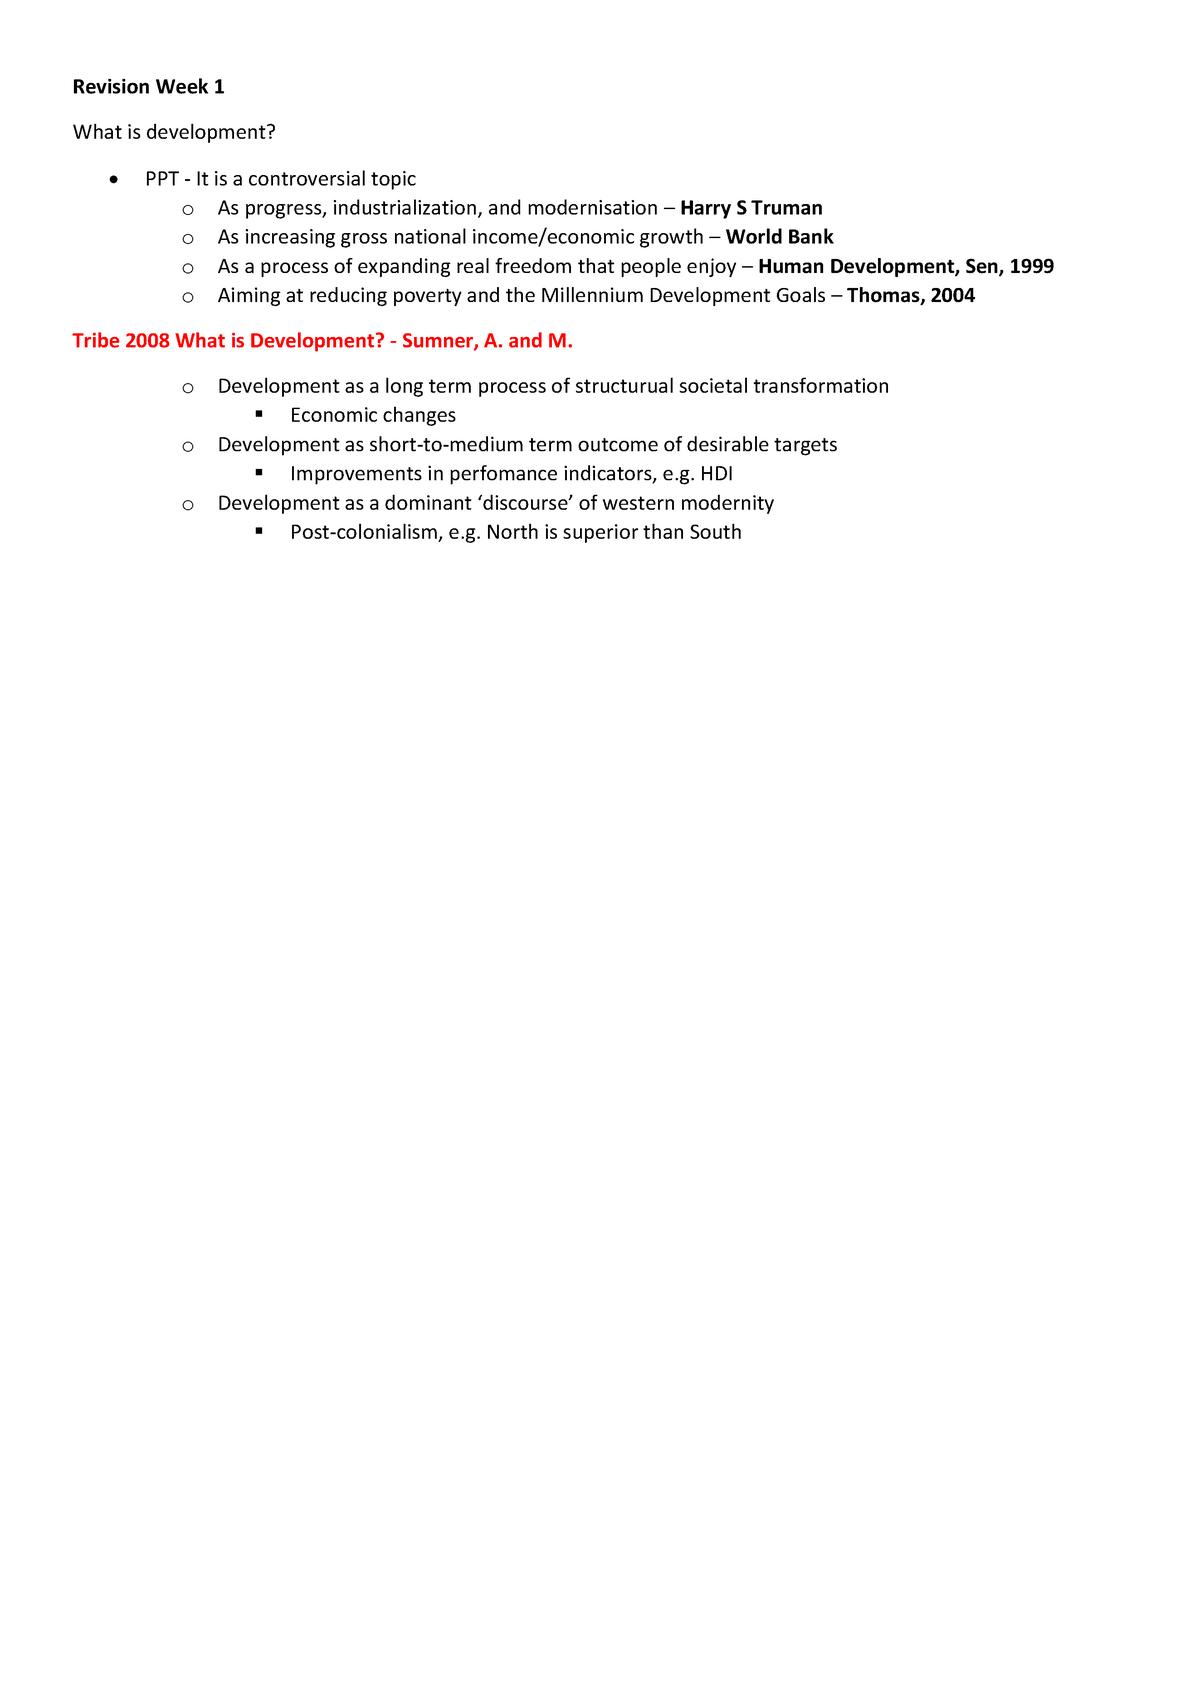 4Yyd0001 Introduction To Development Studies Exam Note - StuDocu